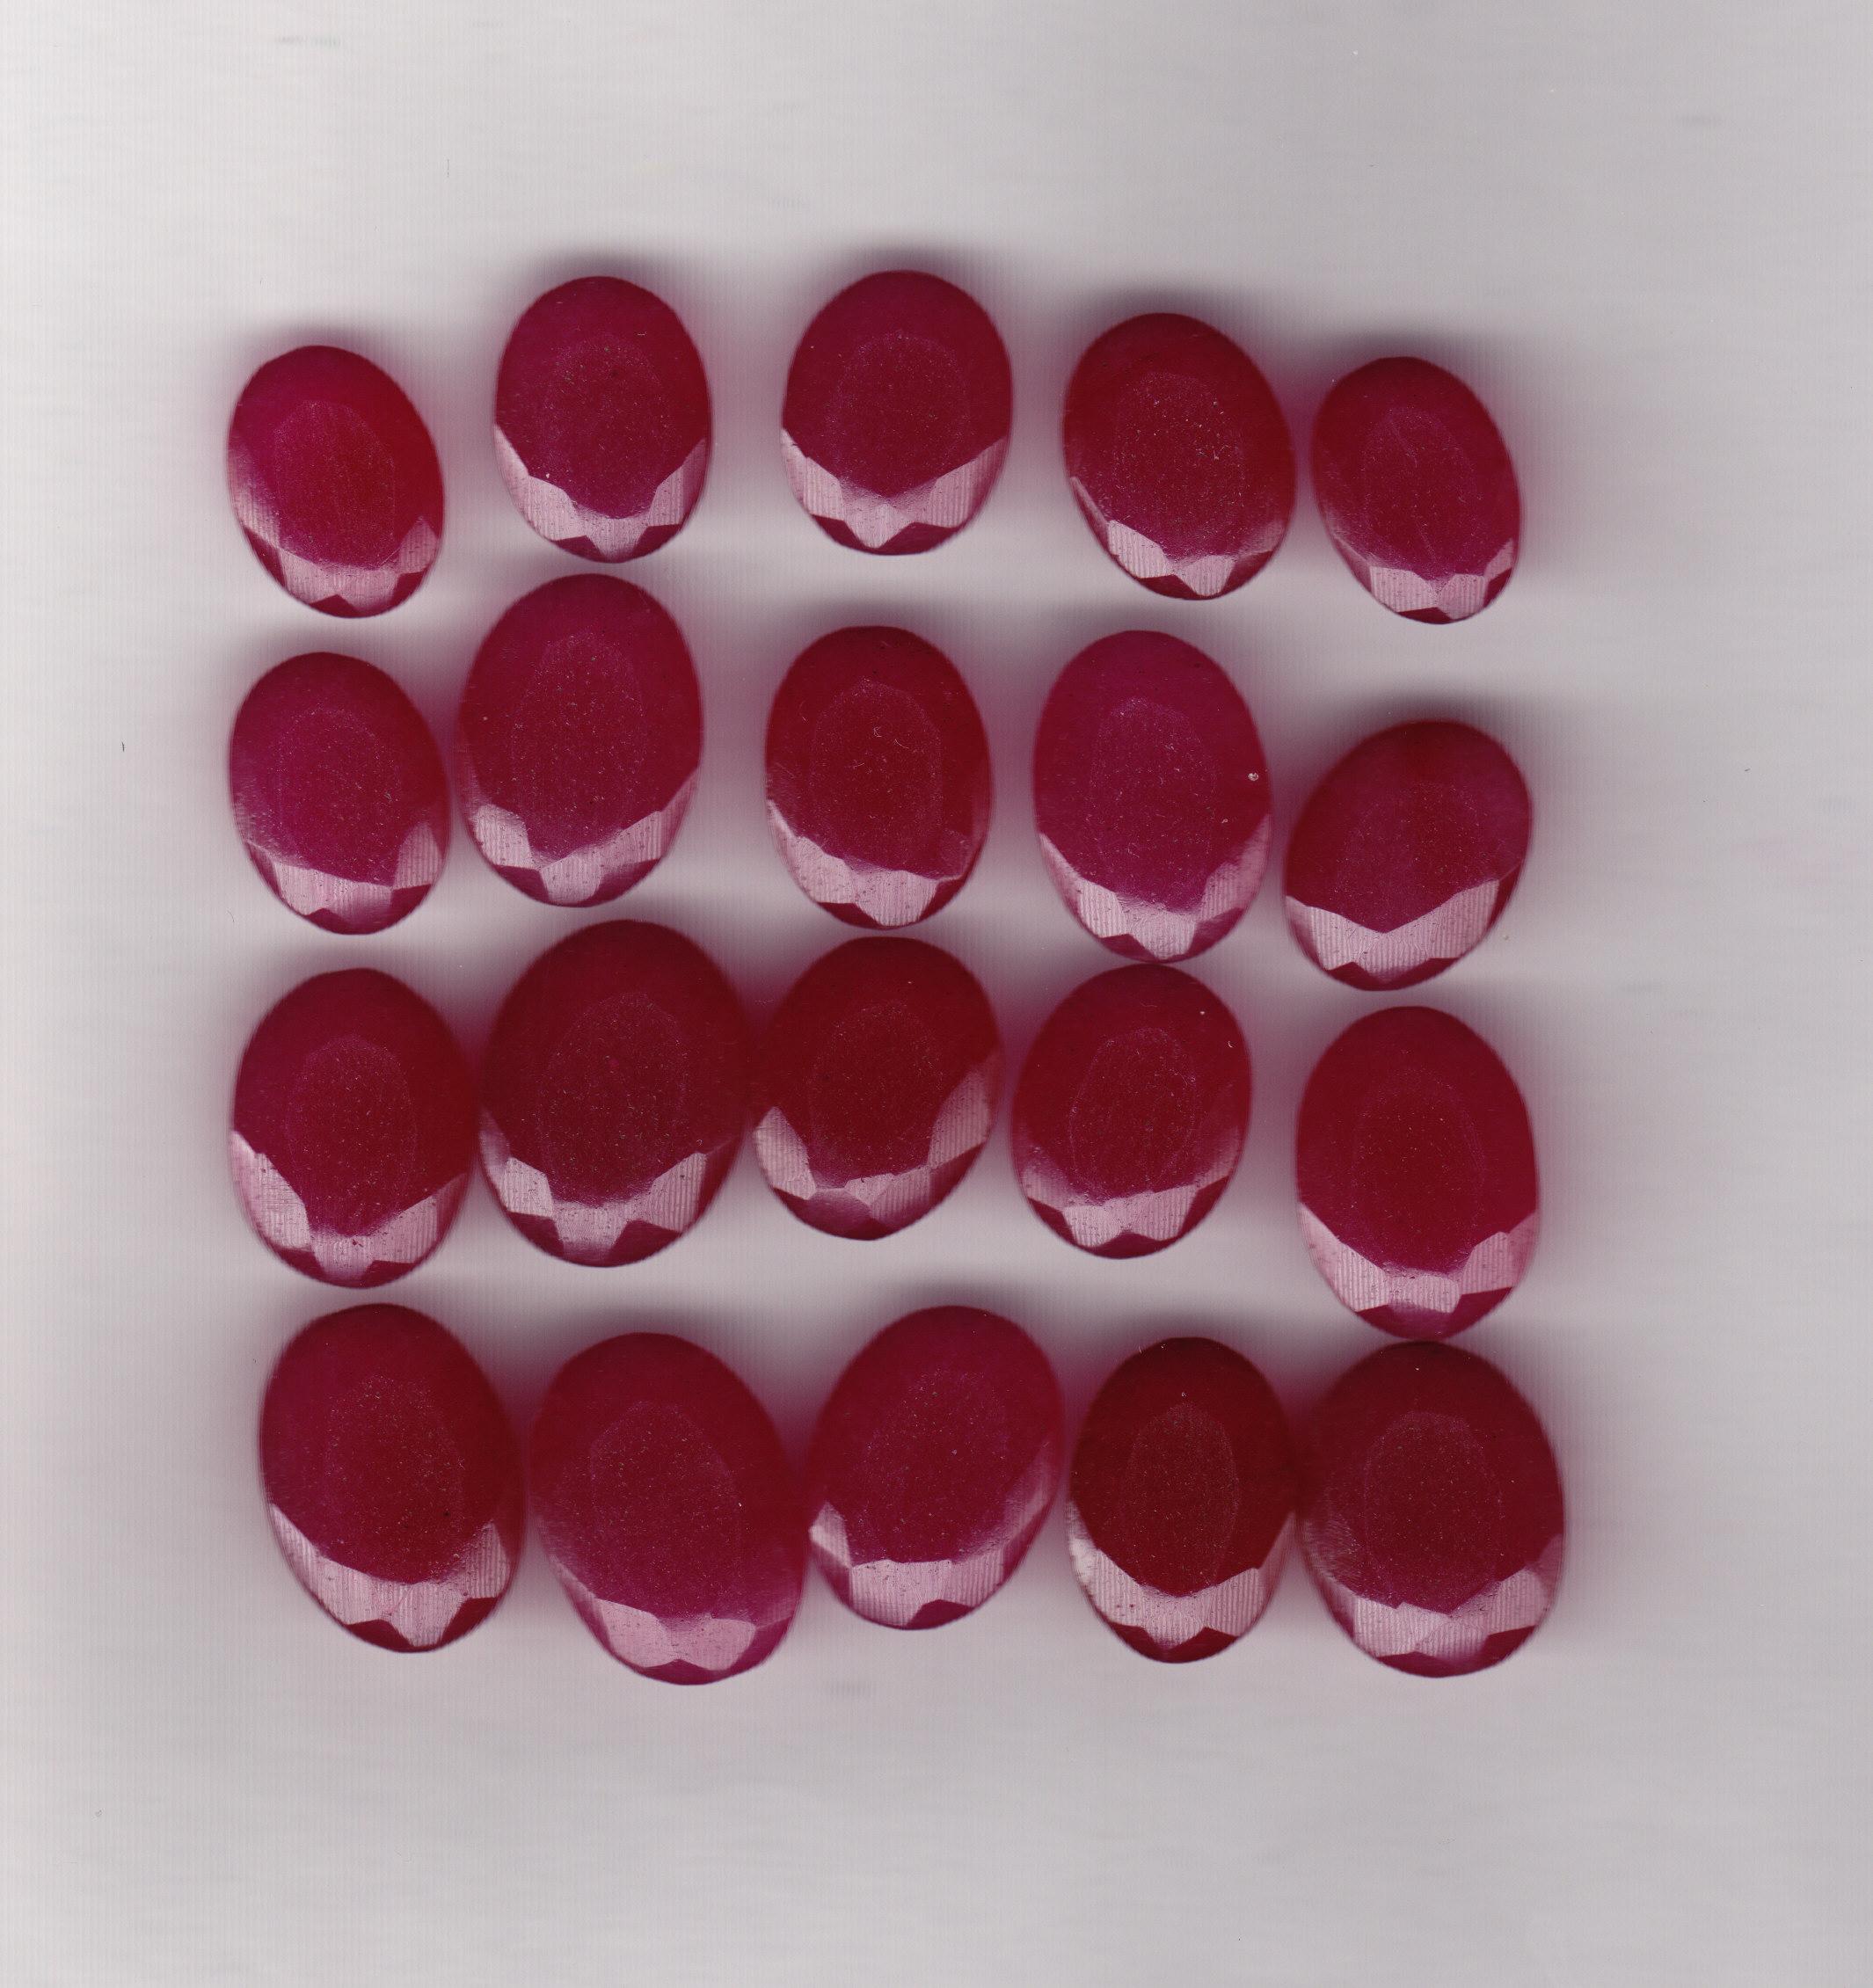 Bluff Ruby Stones Fake Ruby Stones Fake Rubies